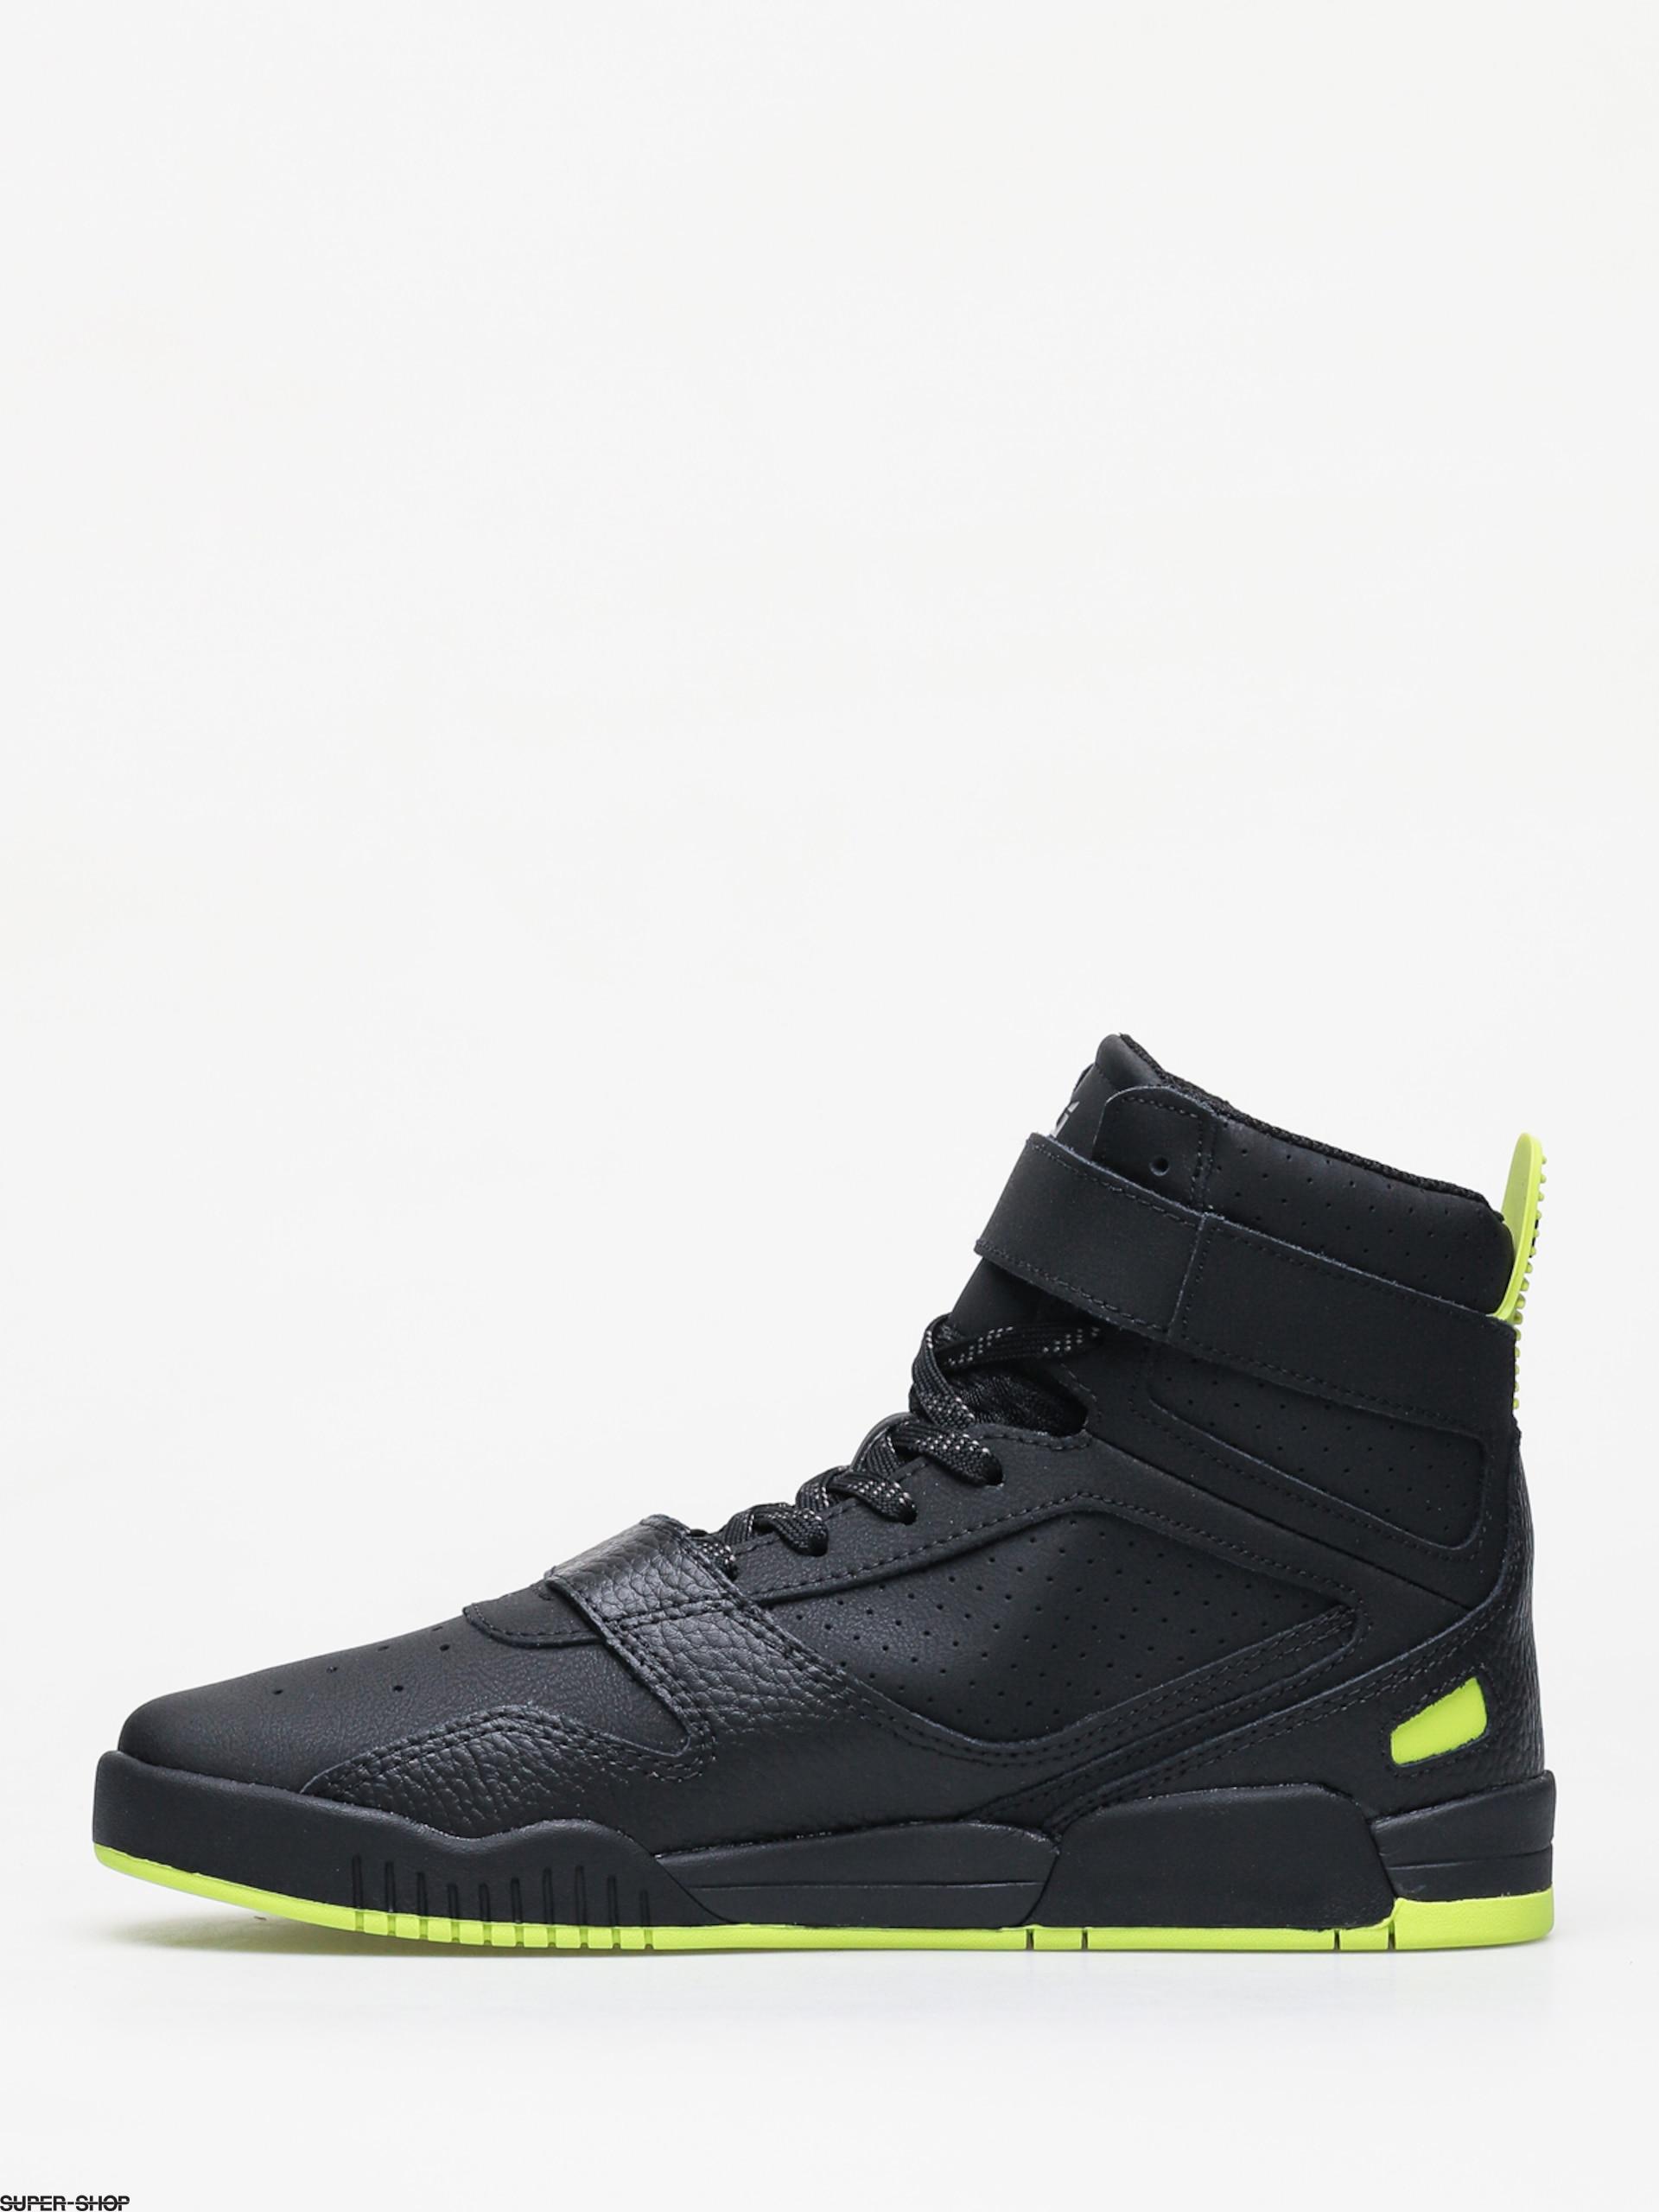 Chaussures SUPRA BREAKER black lime black